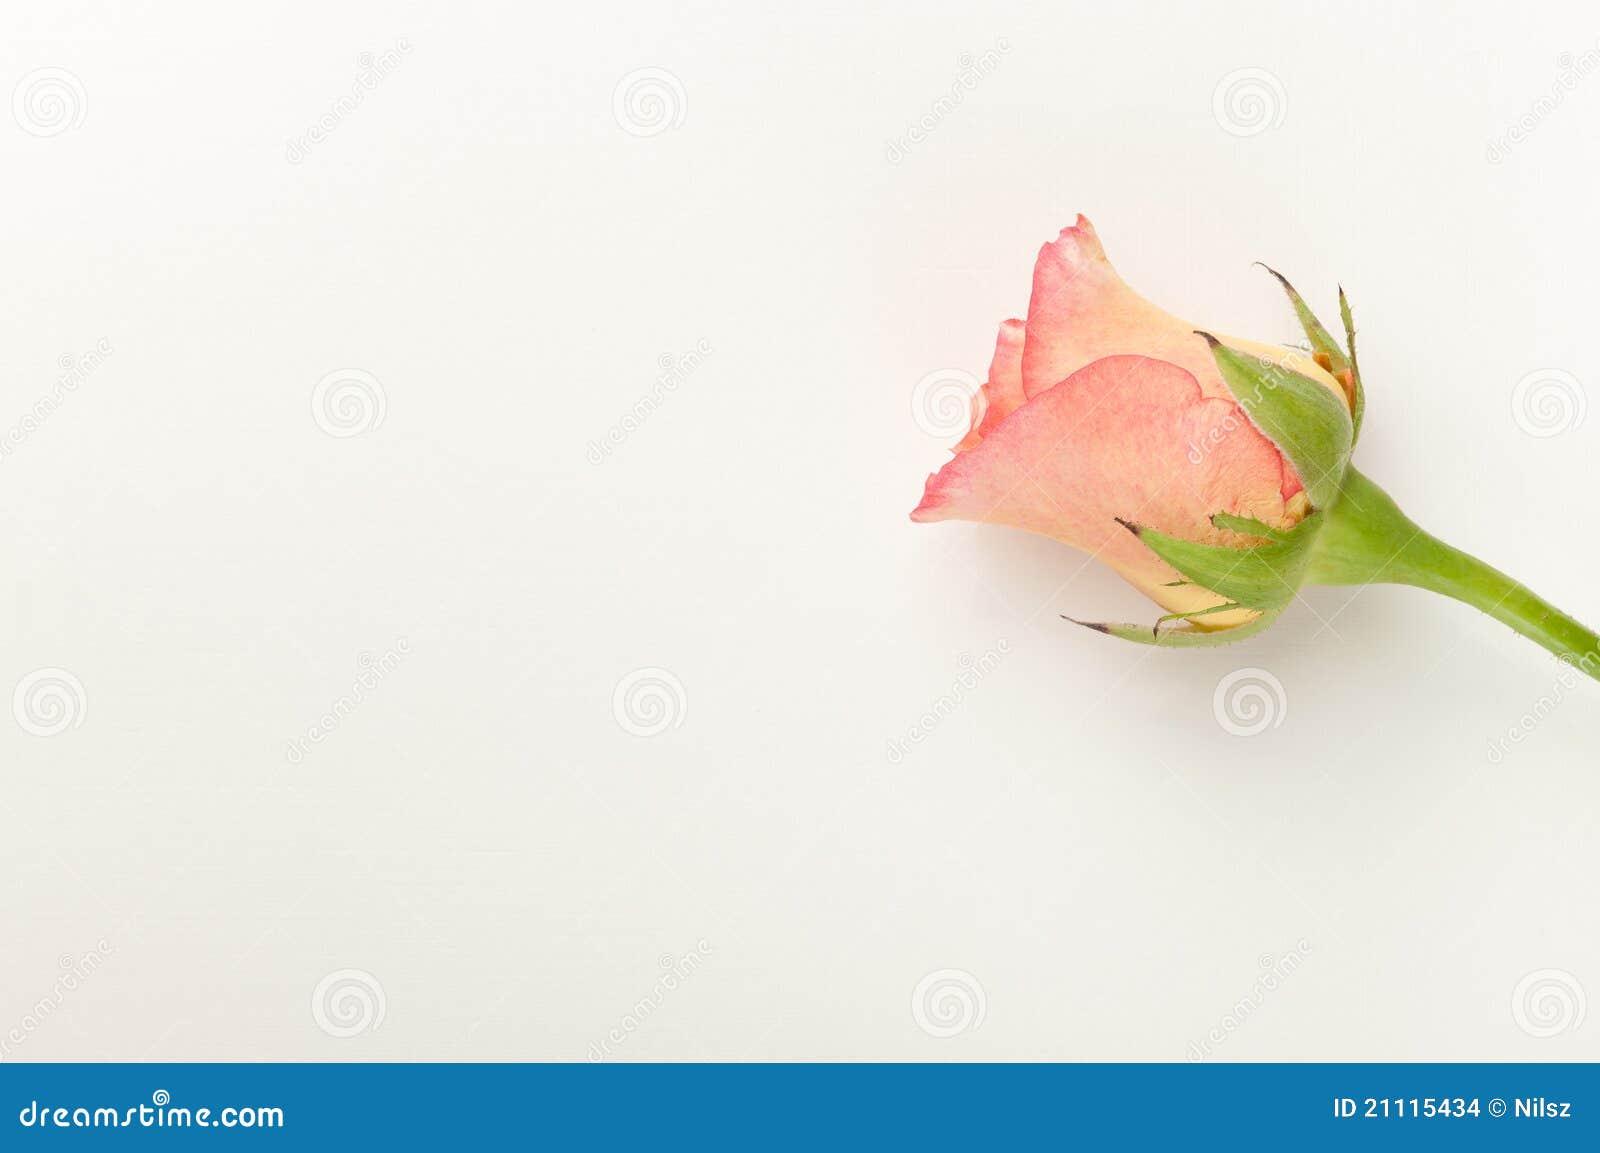 Blank Wedding Invitation Designs for beautiful invitation layout